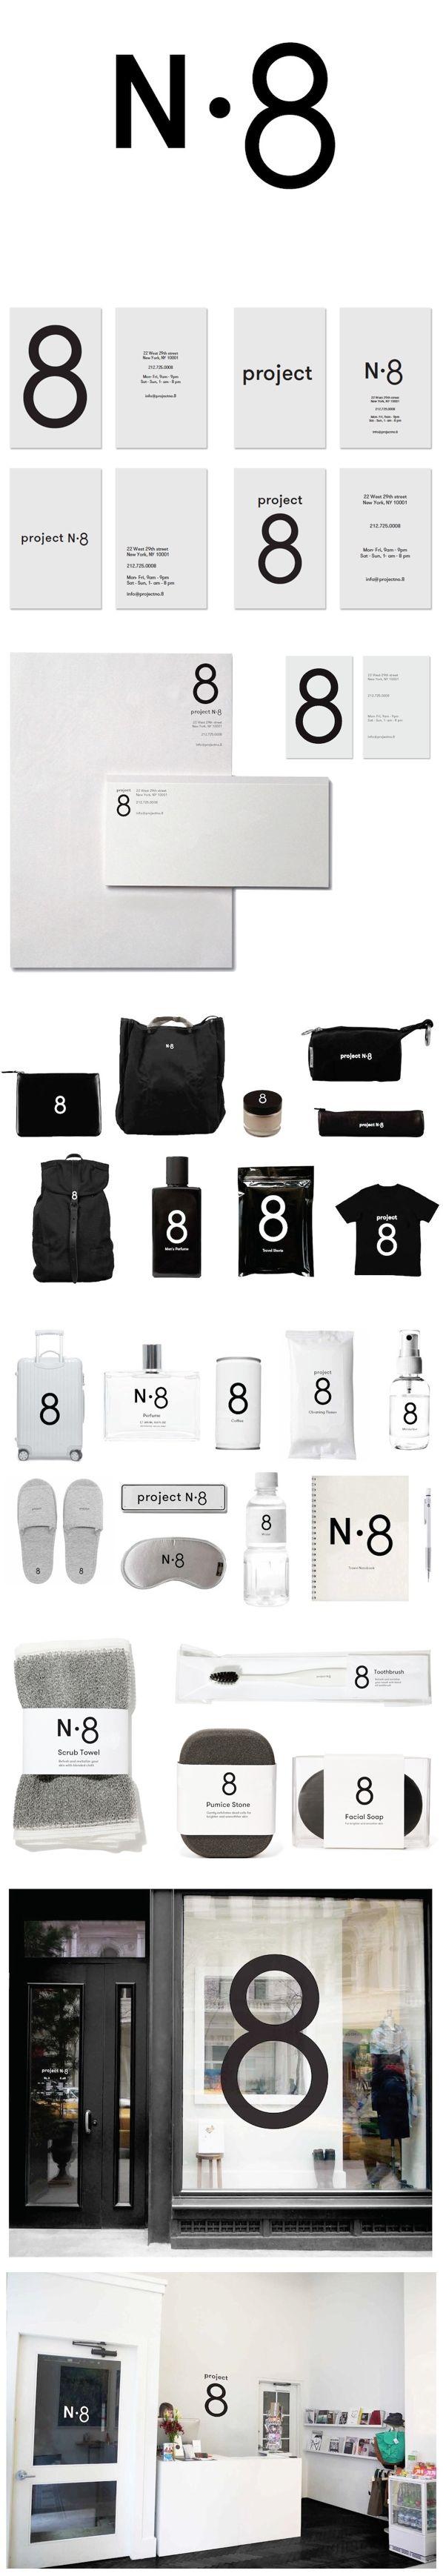 No. 8 #branding #identity #design #graphicdesign